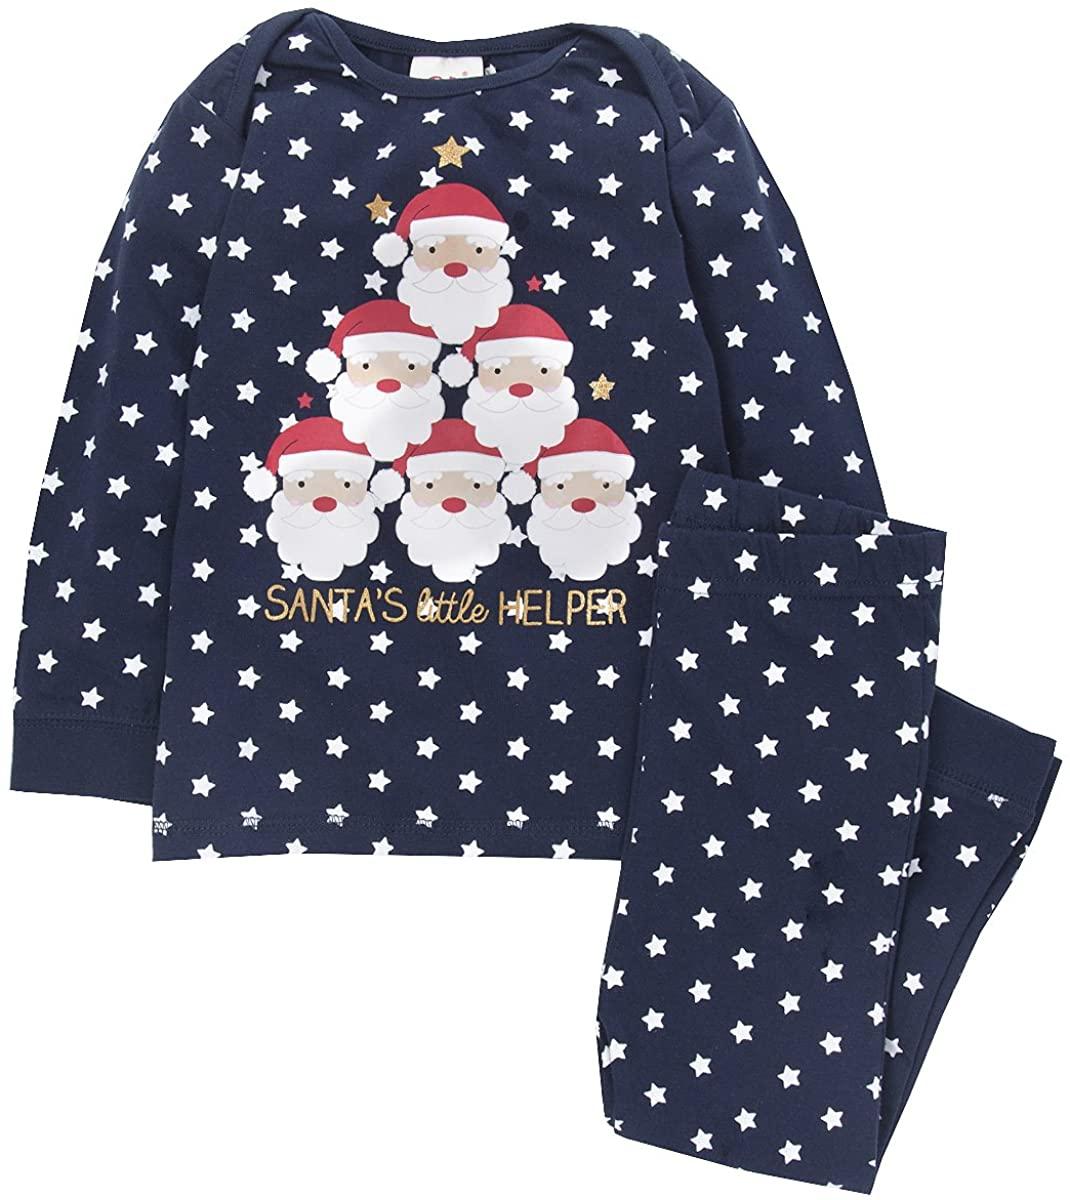 QT Unisex Baby Toddler Boys Girls Novelty Christmas Pajamas (Sizes 6-24m) 100% Cotton PJ Set